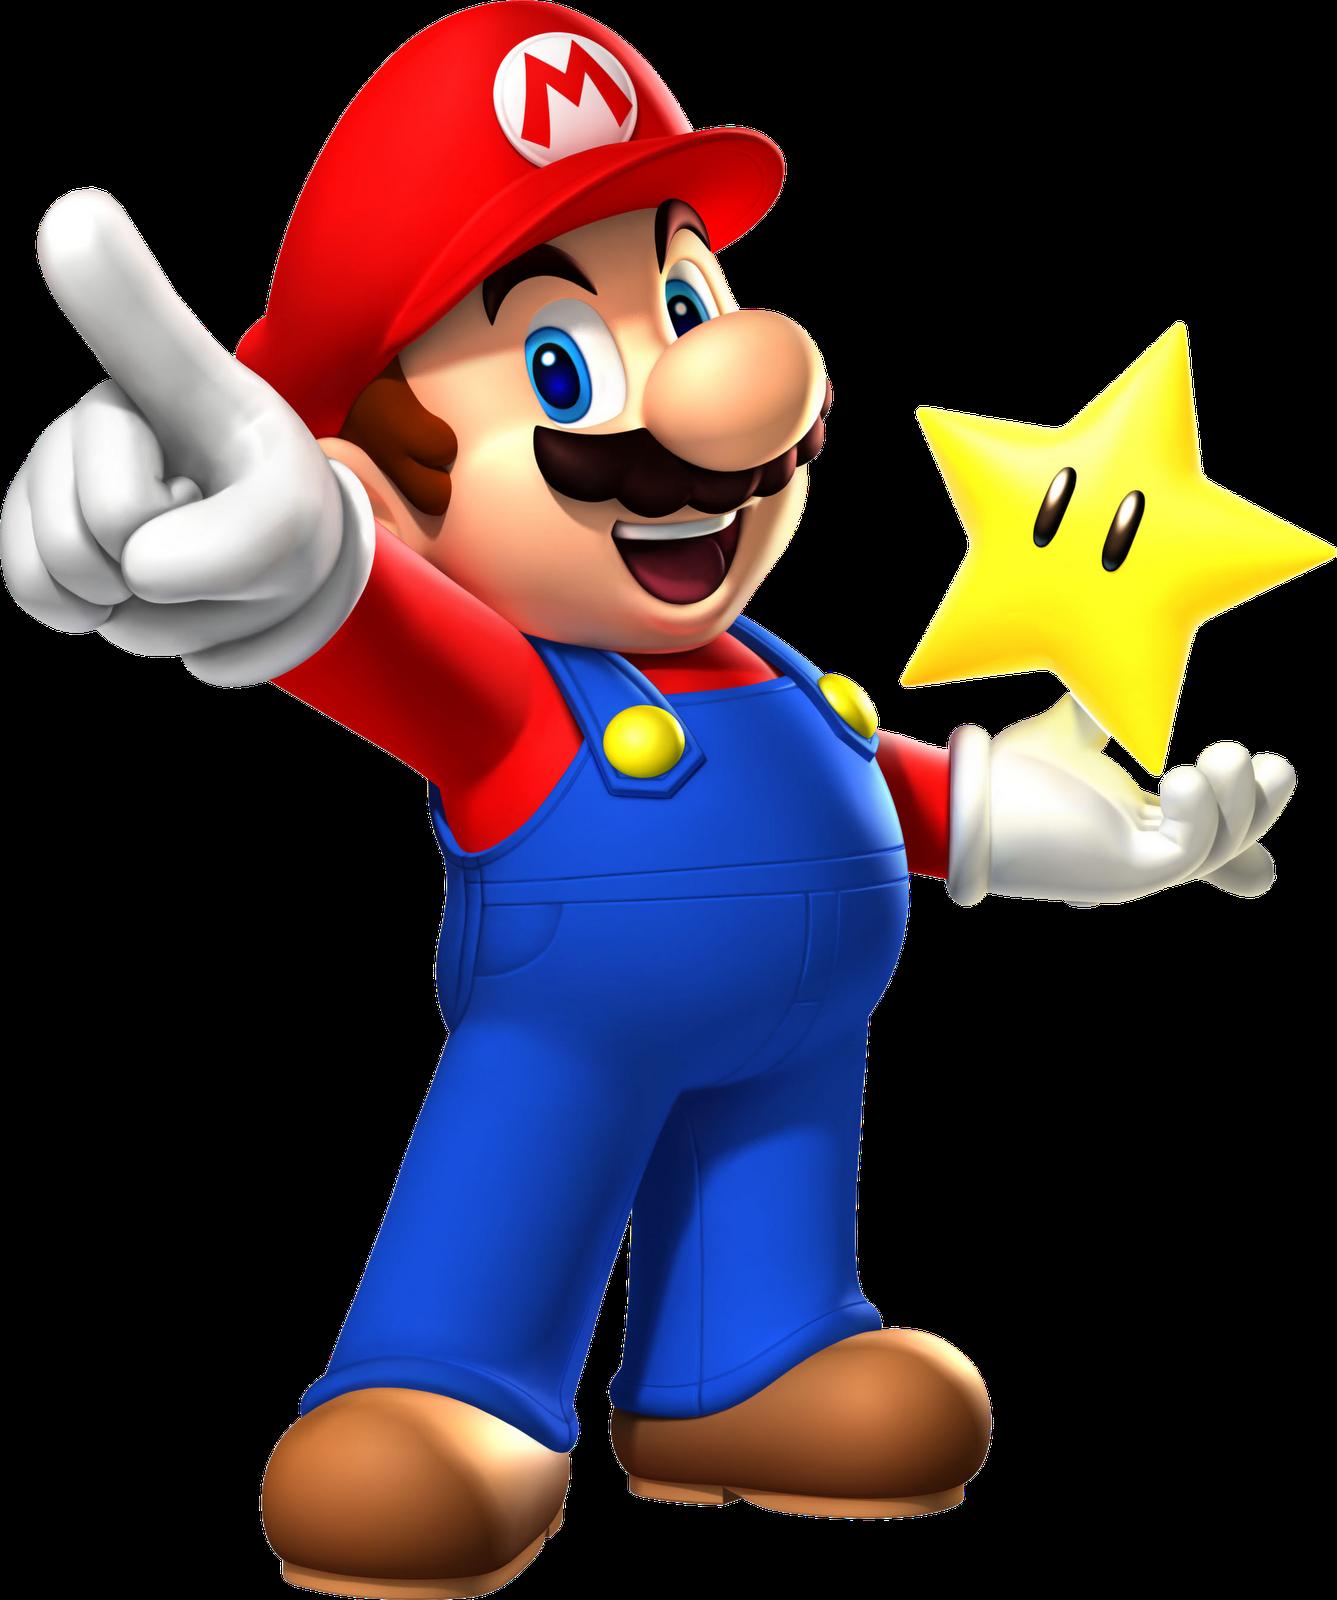 Mario S Resume An Exuberant Character In The Gaming World Compareraja Blog Super Mario Bros Super Mario Mario Bros